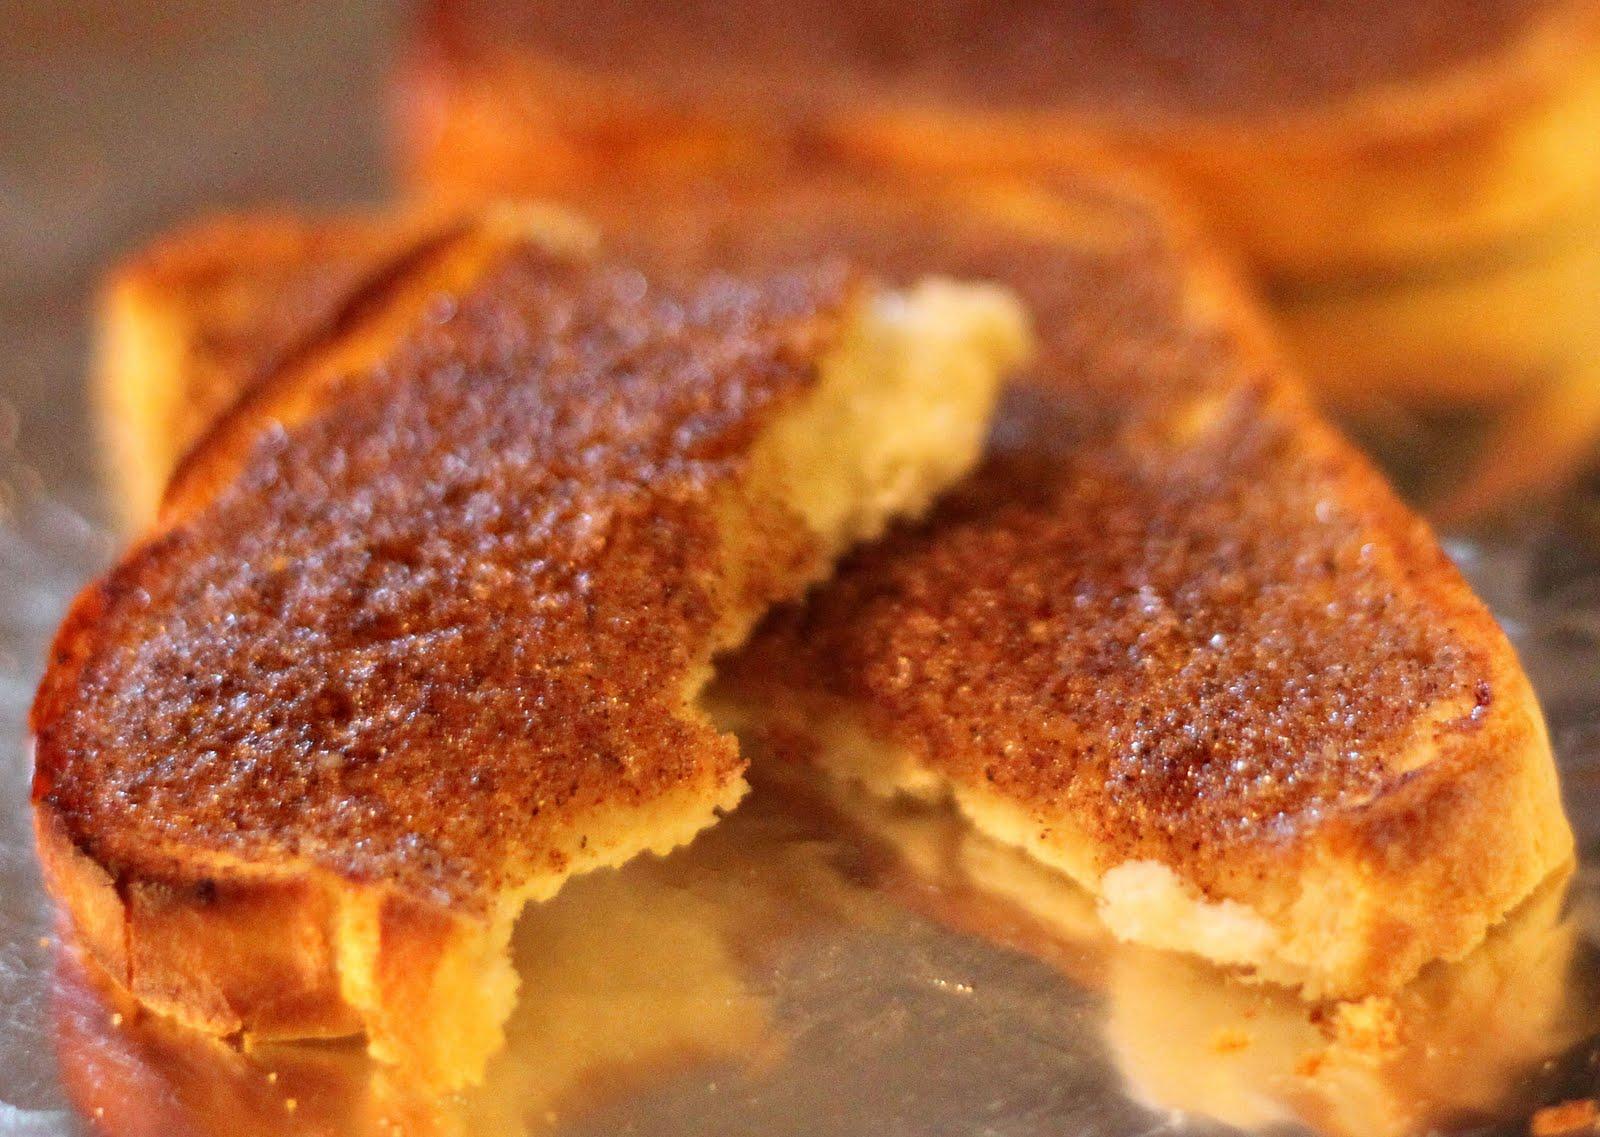 The Good Life: Cinnamon Toast The Right Way